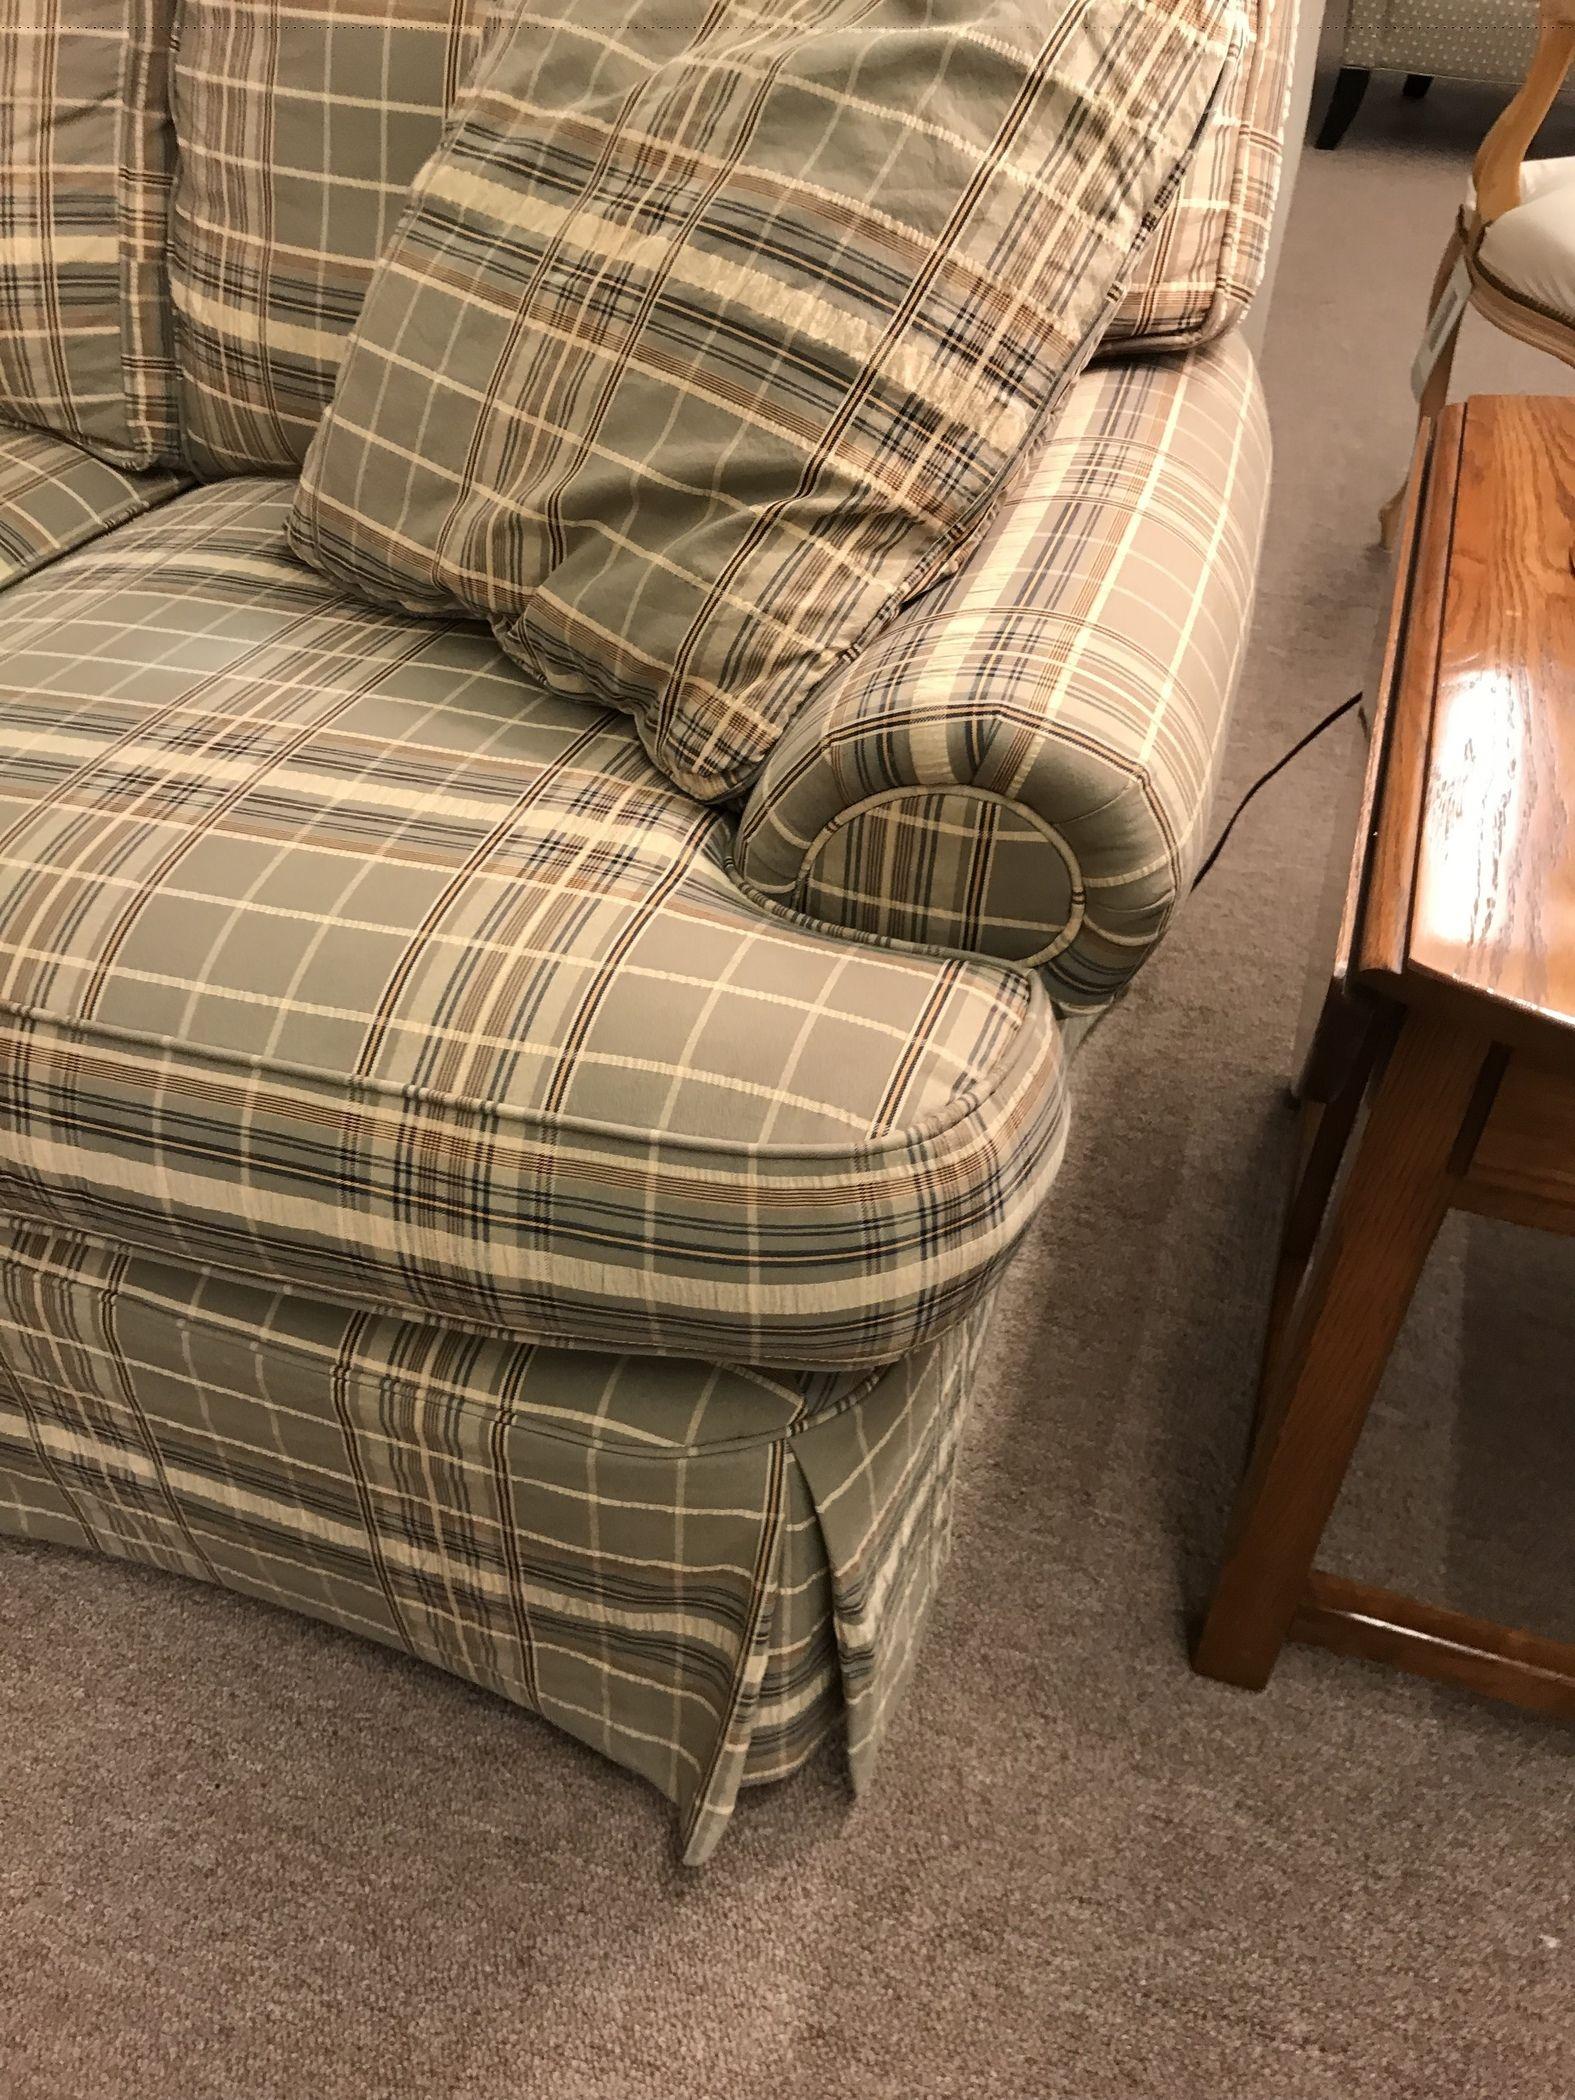 PA HOUSE PLAID SOFA Delmarva Furniture Consignment